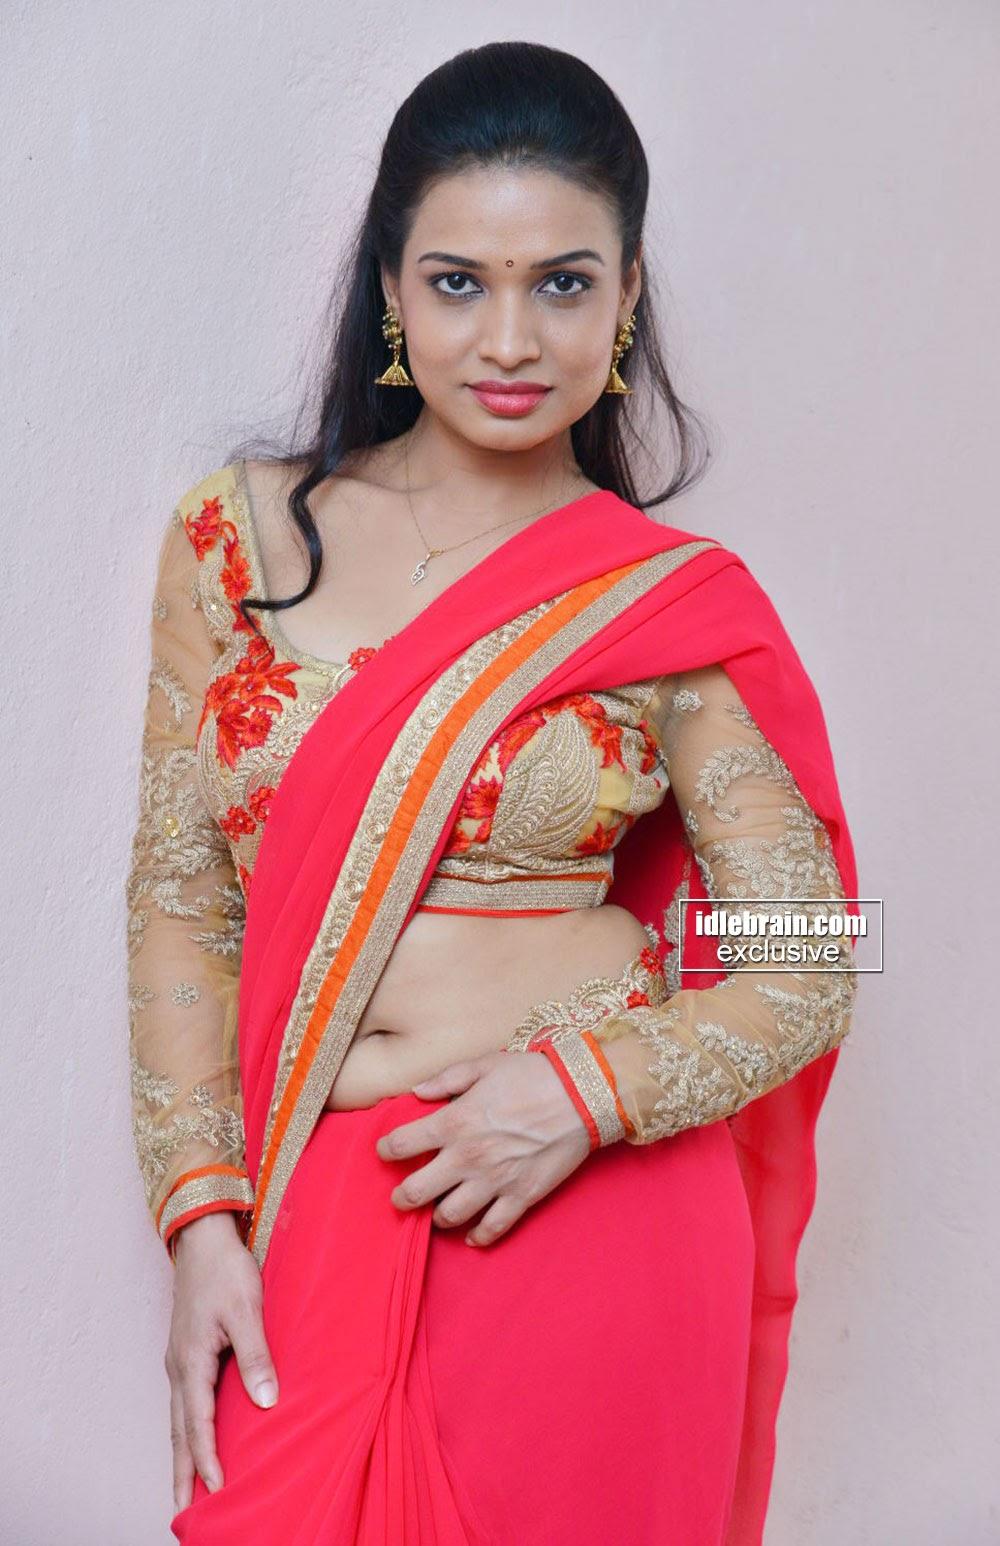 Bhimbika Stunning South Indian Actress in saree and Choli Must see